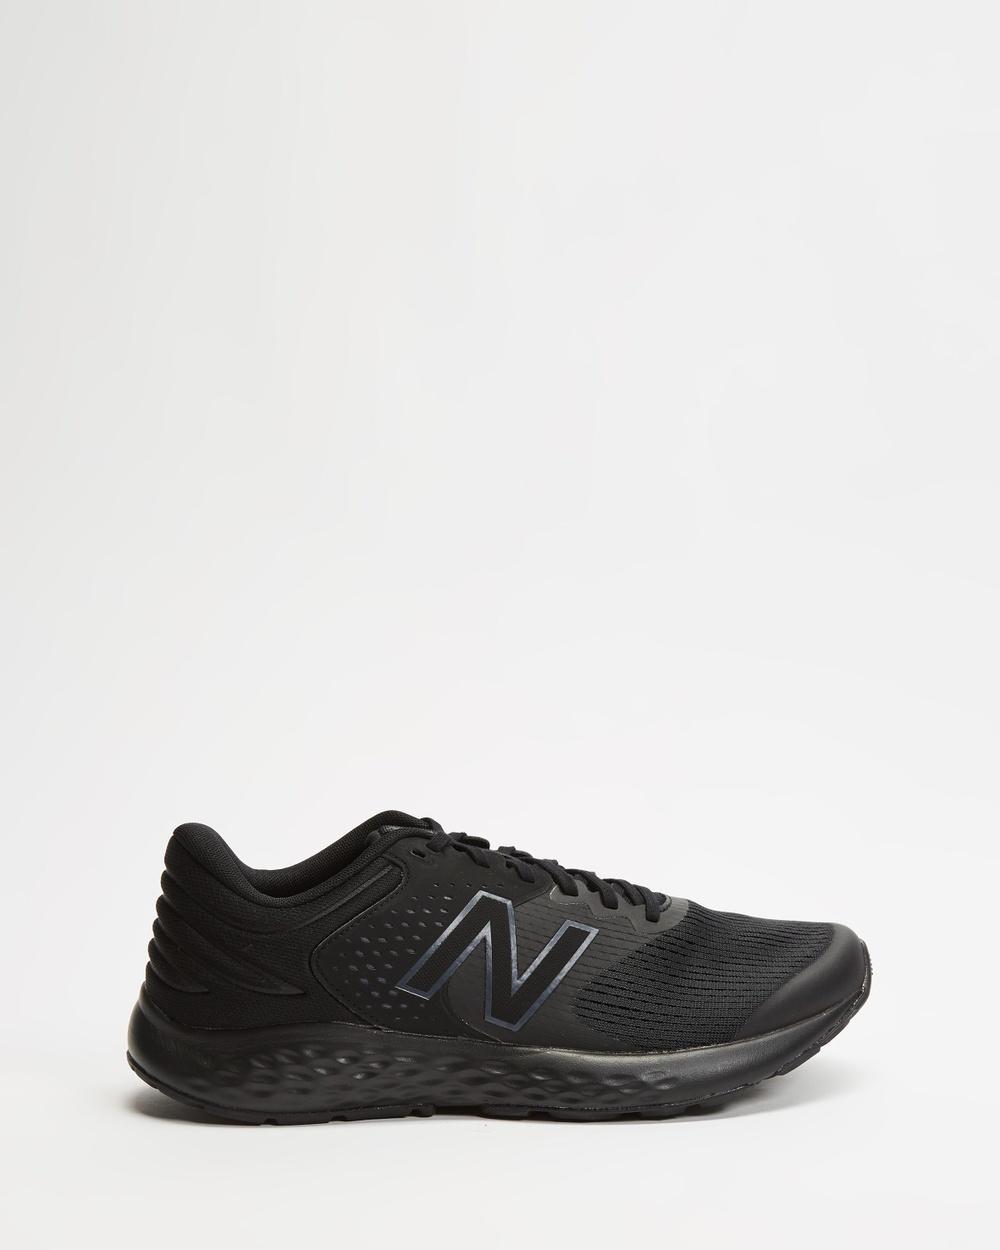 New Balance 520 V7 Men's Performance Shoes Black